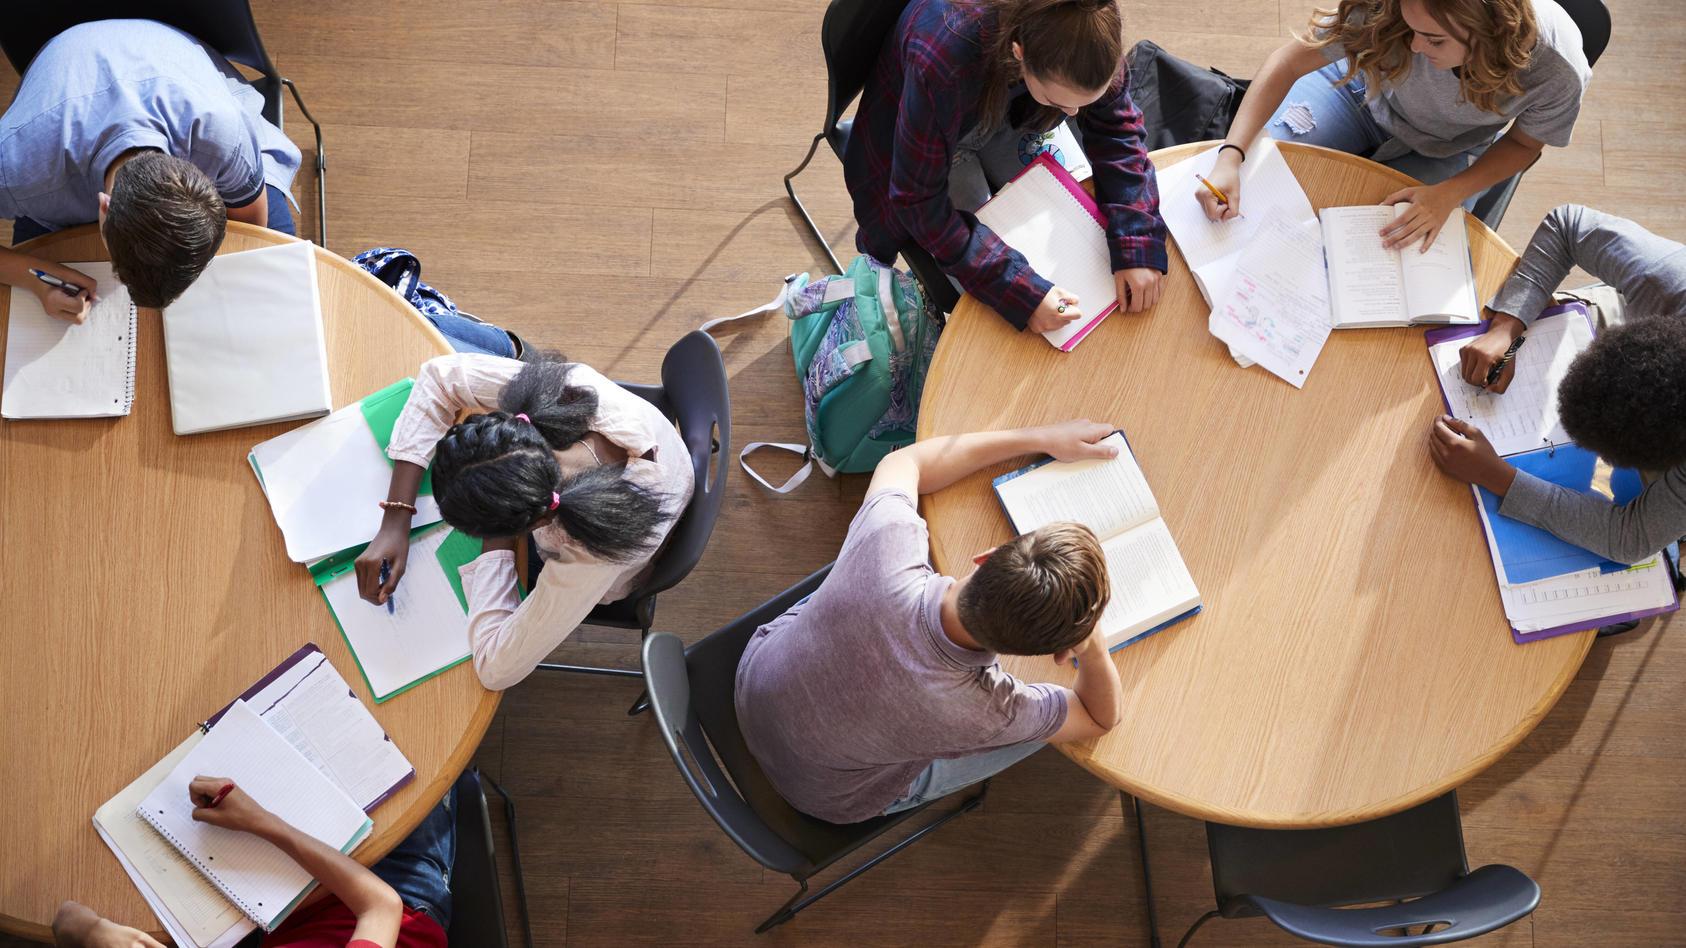 schule,hausaufgaben,gruppenarbeit *** school,homework,teamwork mmq-vw7,model released, Symbolfoto